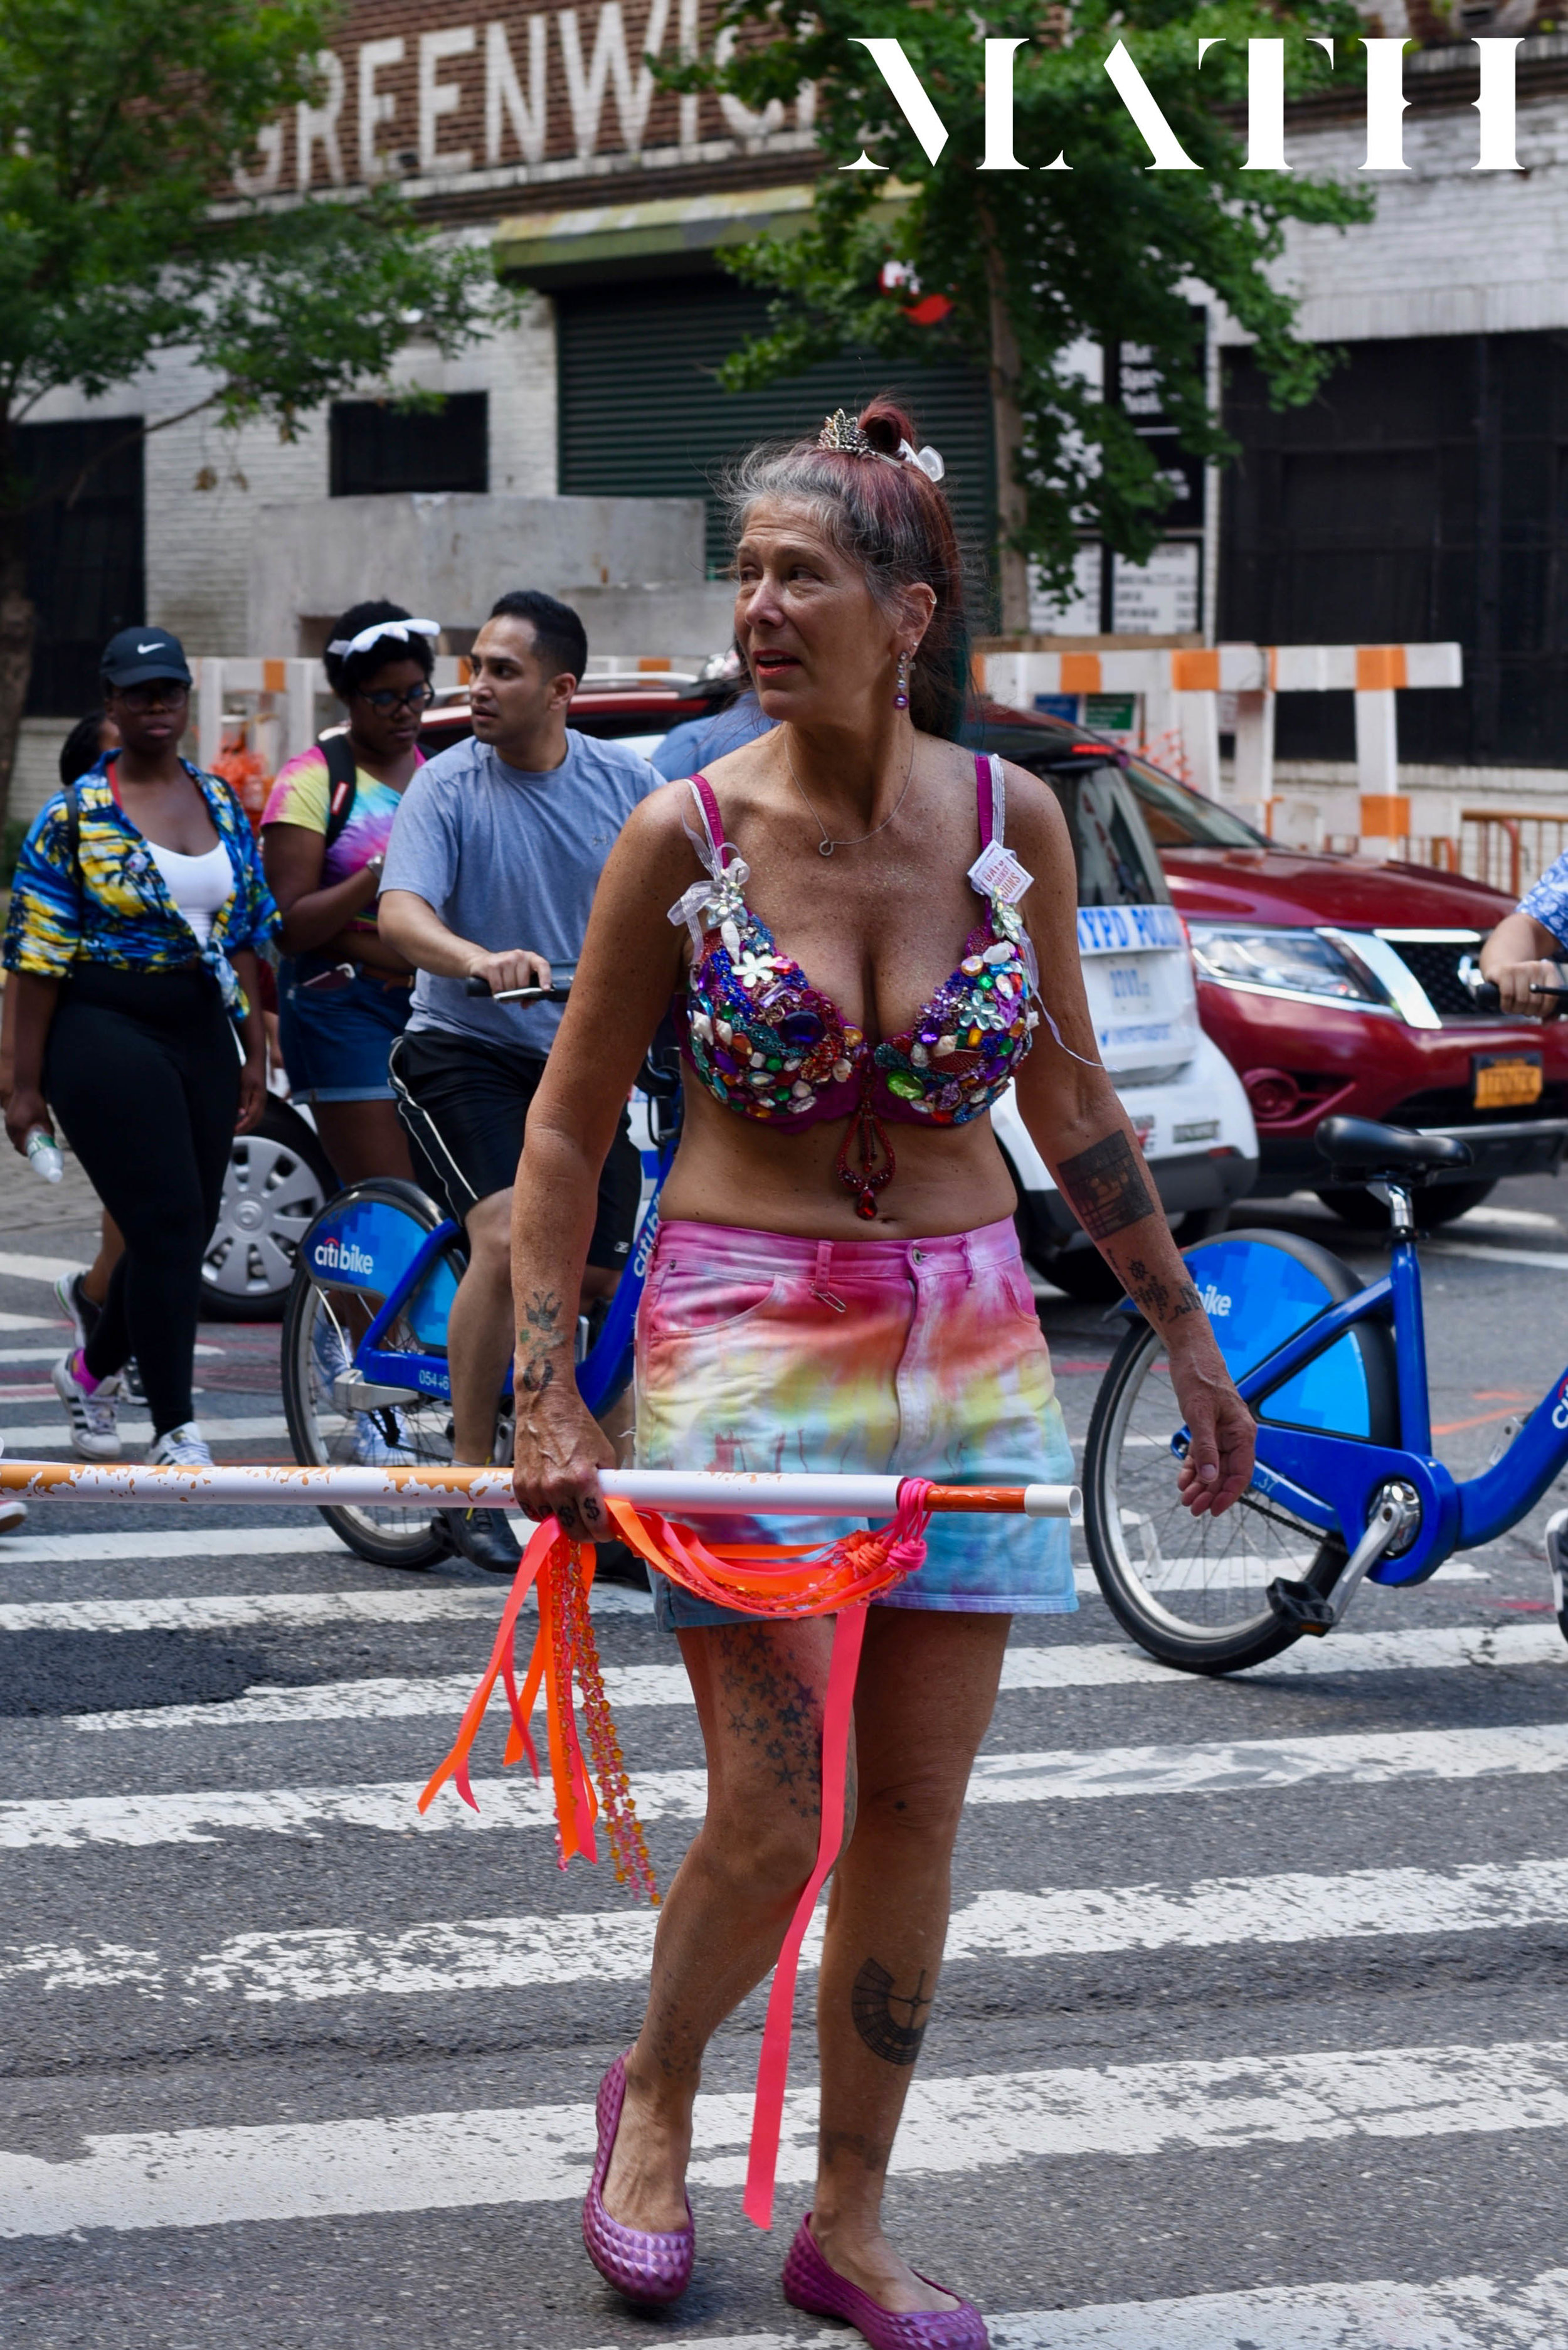 NYC Pride_Ginger Hollander 16.jpg